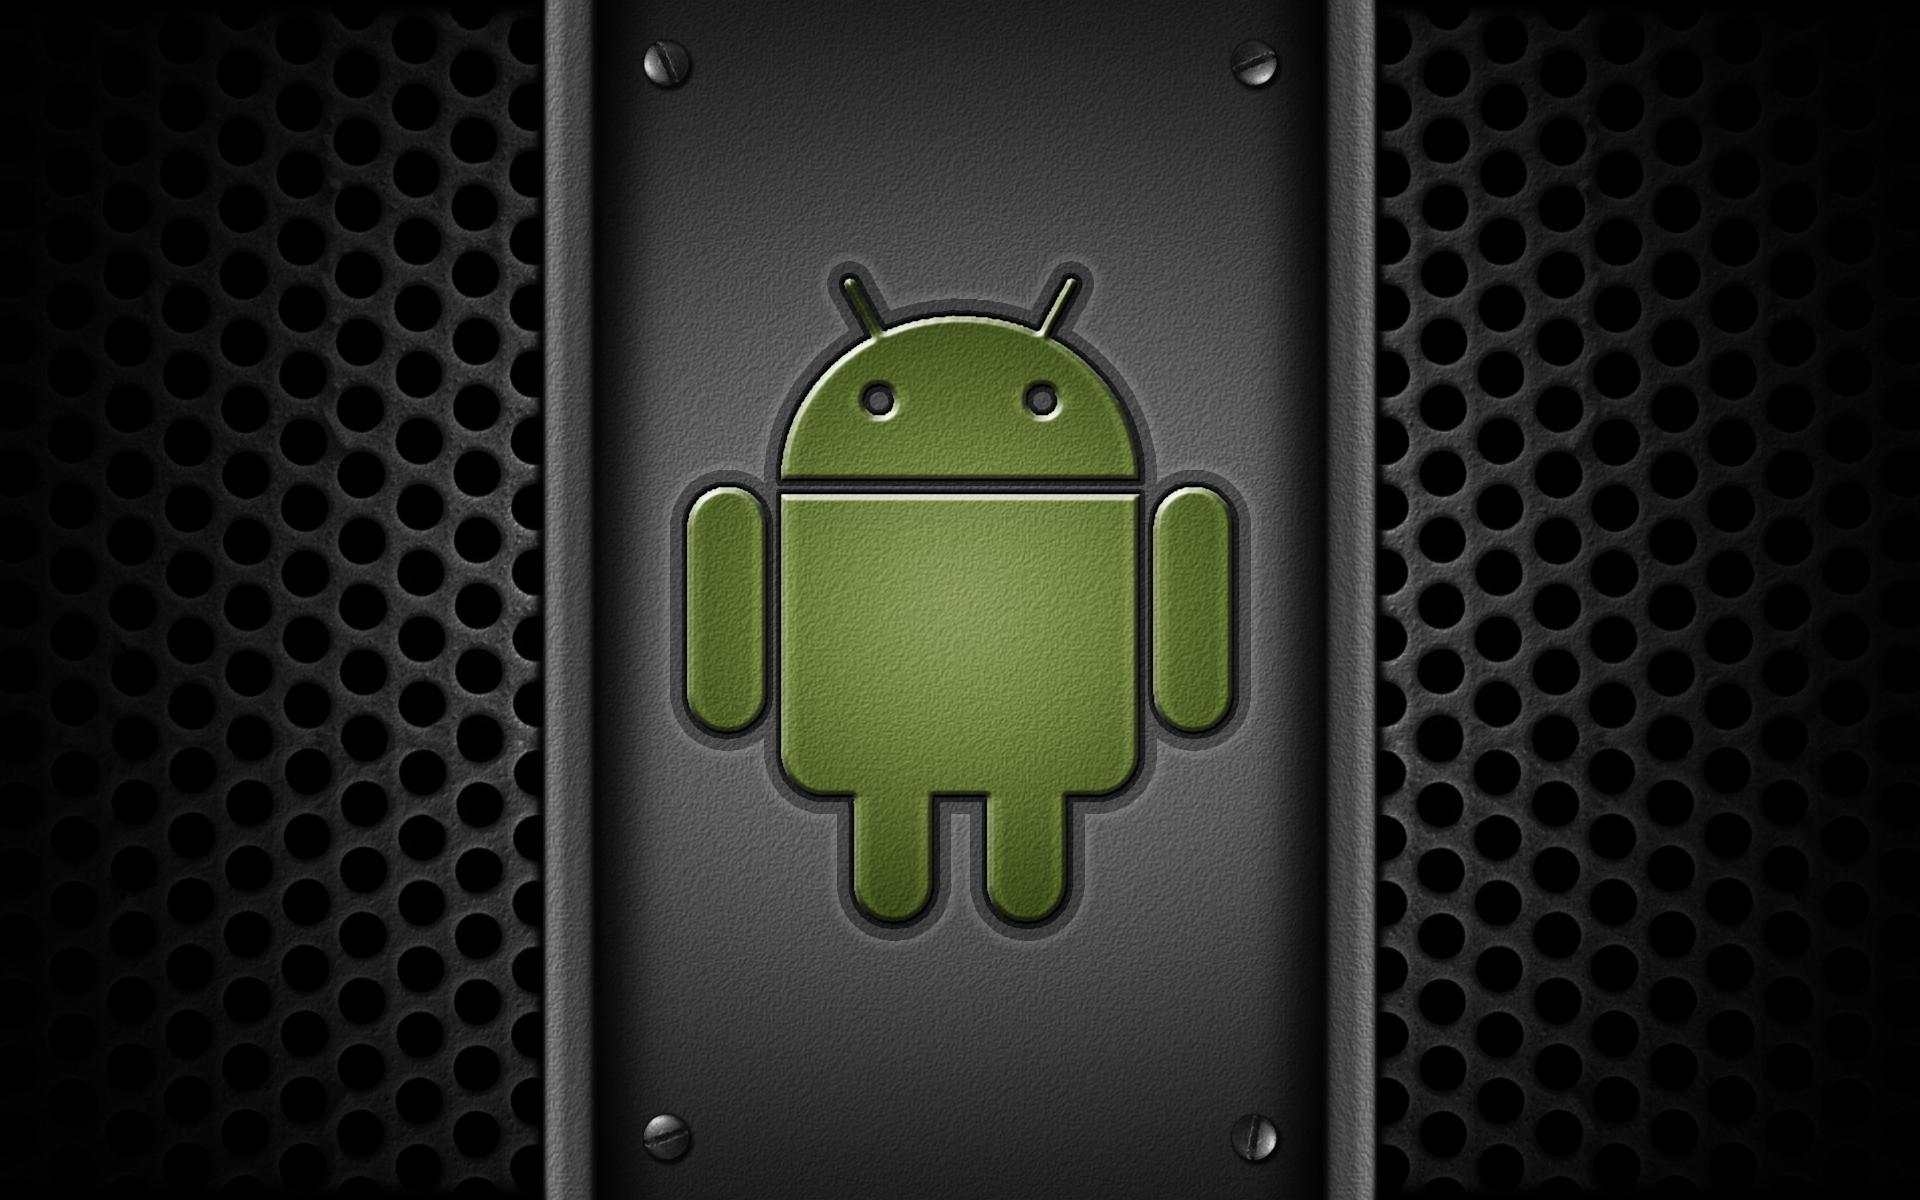 Hd wallpaper android - Description Android Tablet Wallpaper Is A Hi Res Wallpaper For Pc